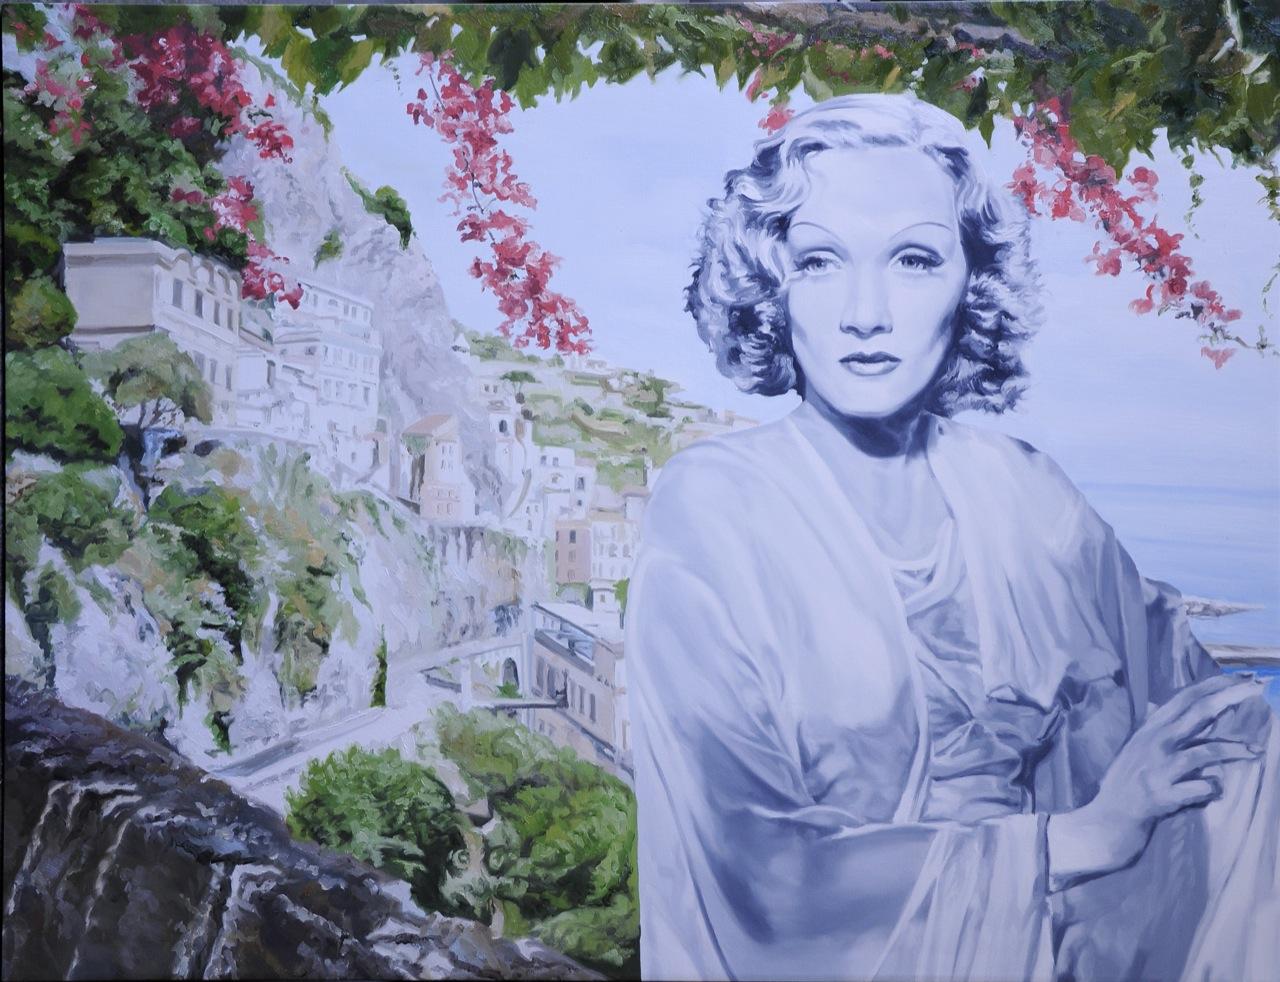 Gian Marco Montesano, Mediterranes Lied, 2011 - olio su tela, 100 x 130